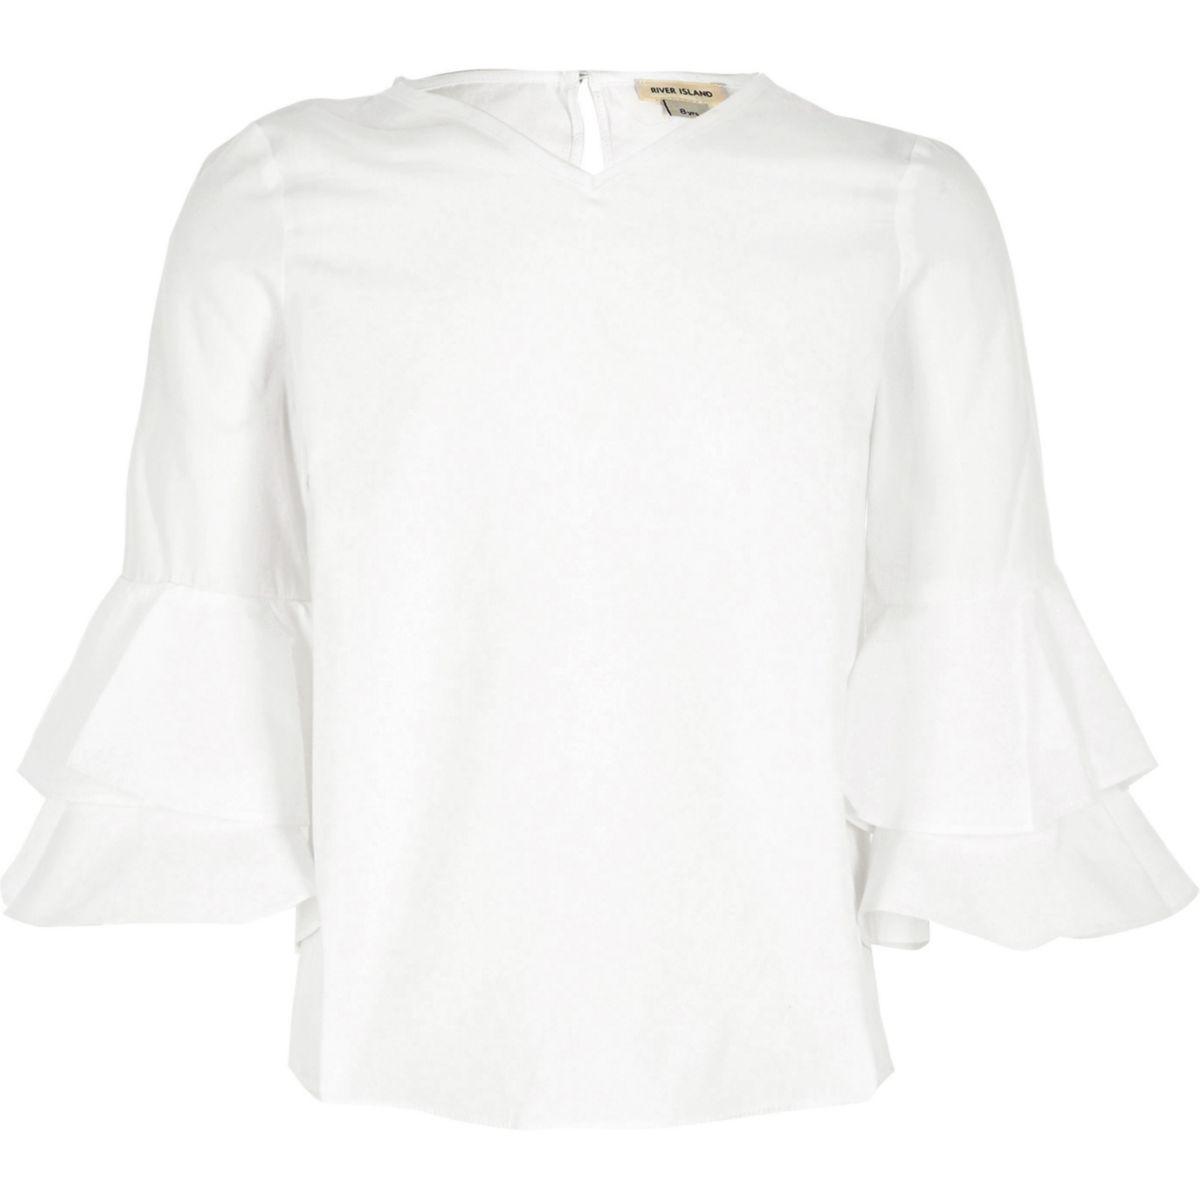 Girls cream double frill sleeve top